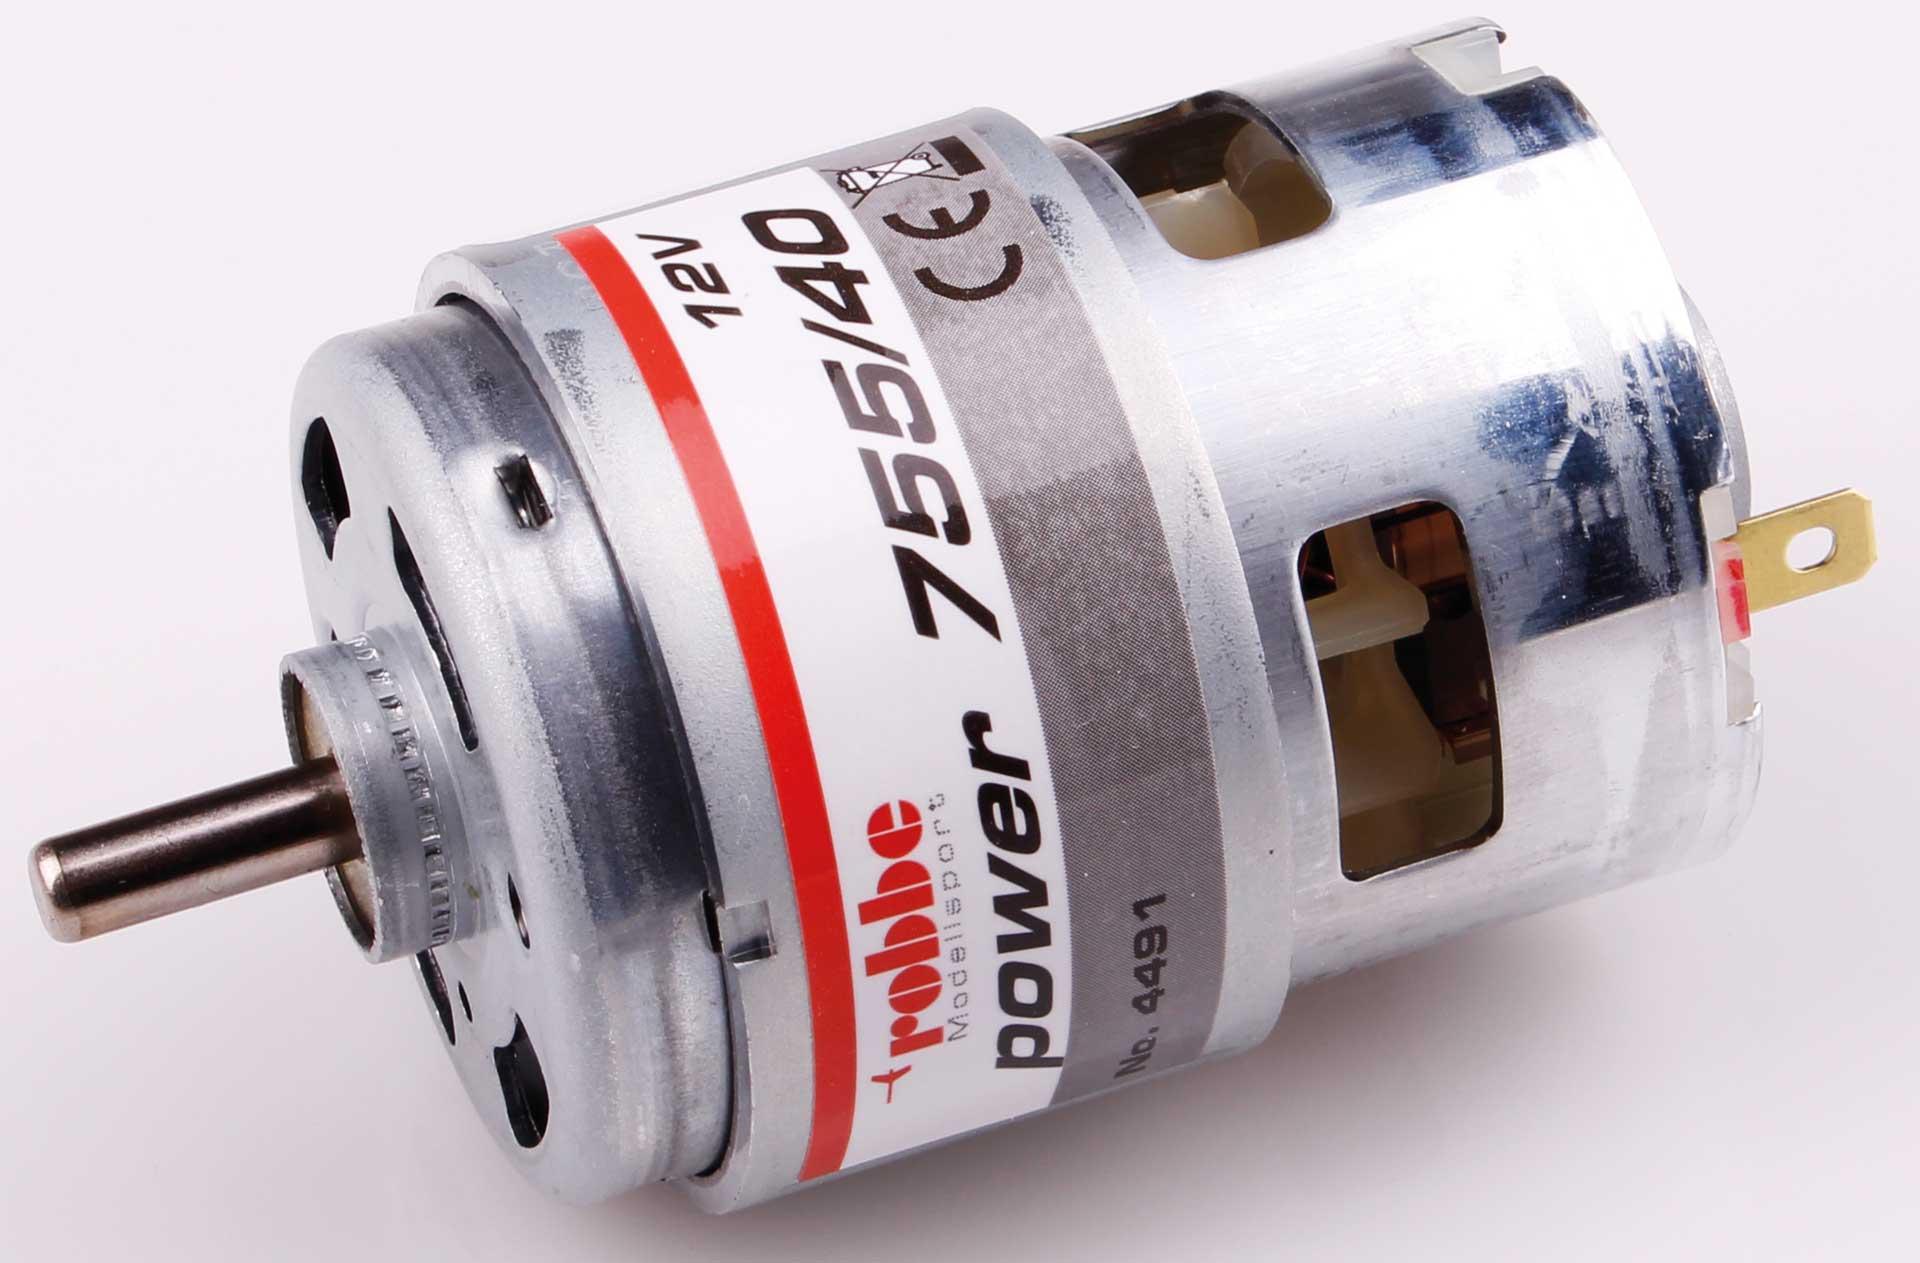 Robbe Modellsport ROBBE POWER 755/40 BULK / LOSE